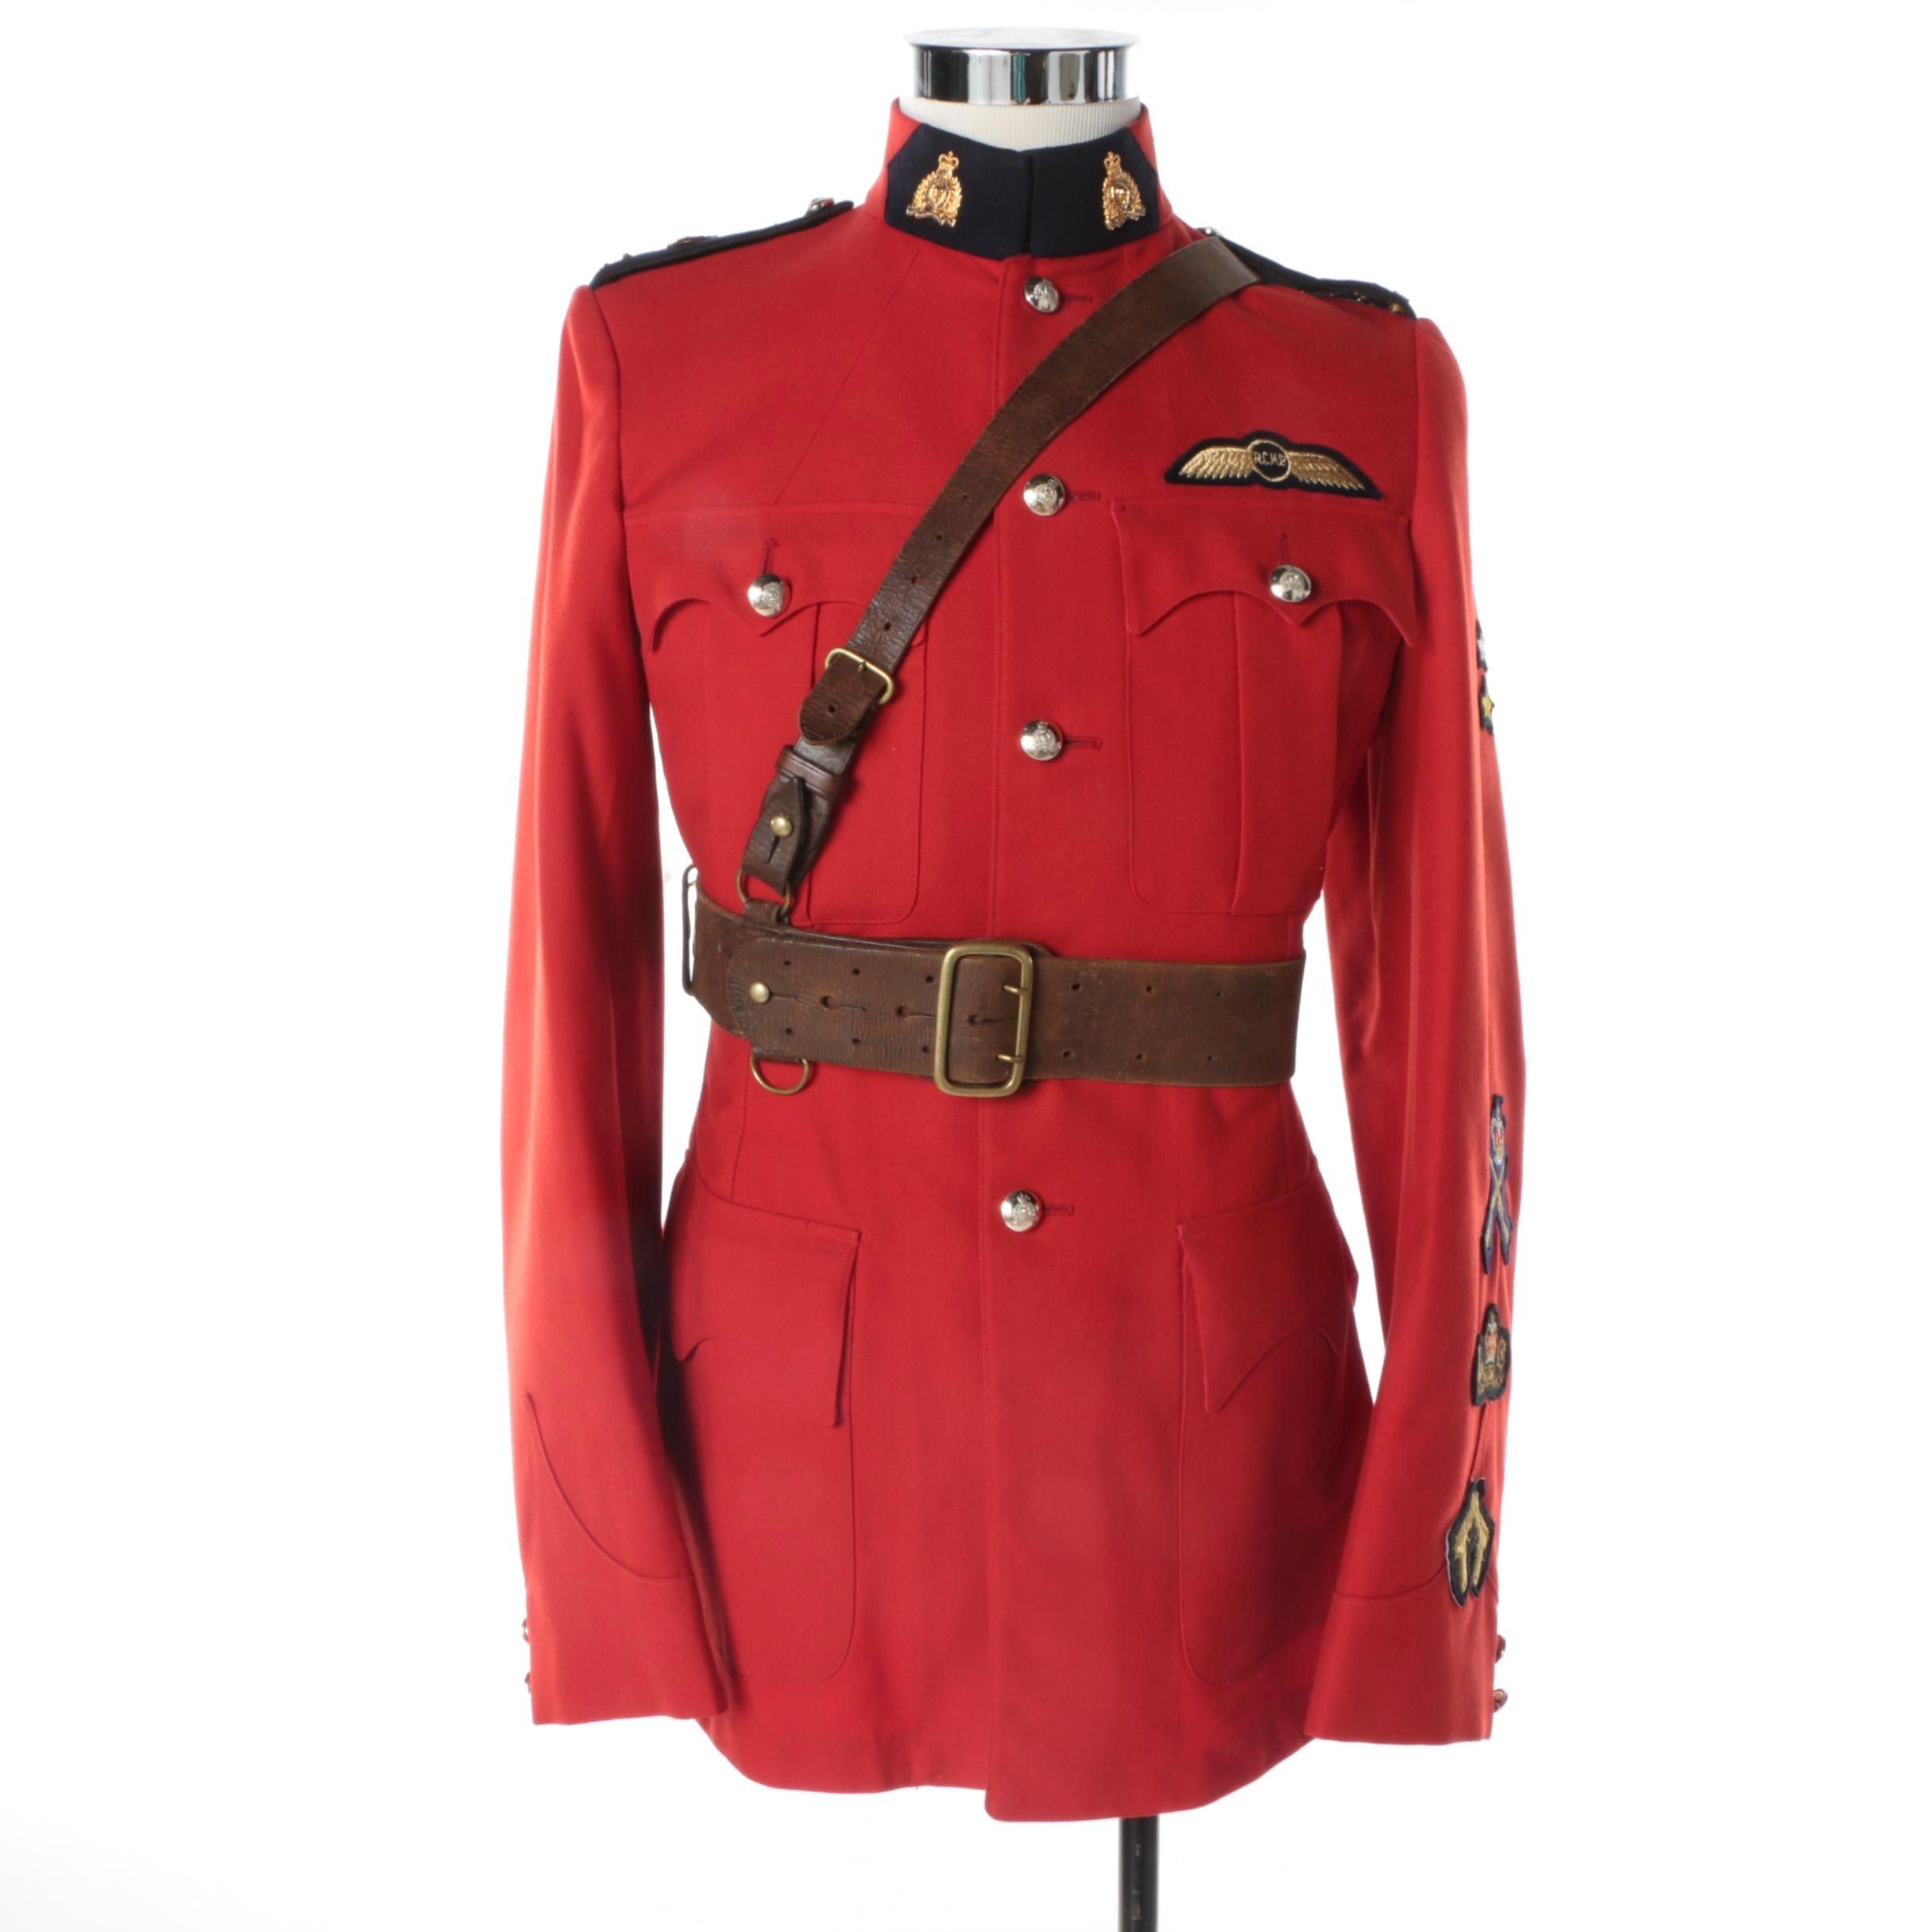 Men's Vintage Royal Canadian Mountain Police Uniform Jacket